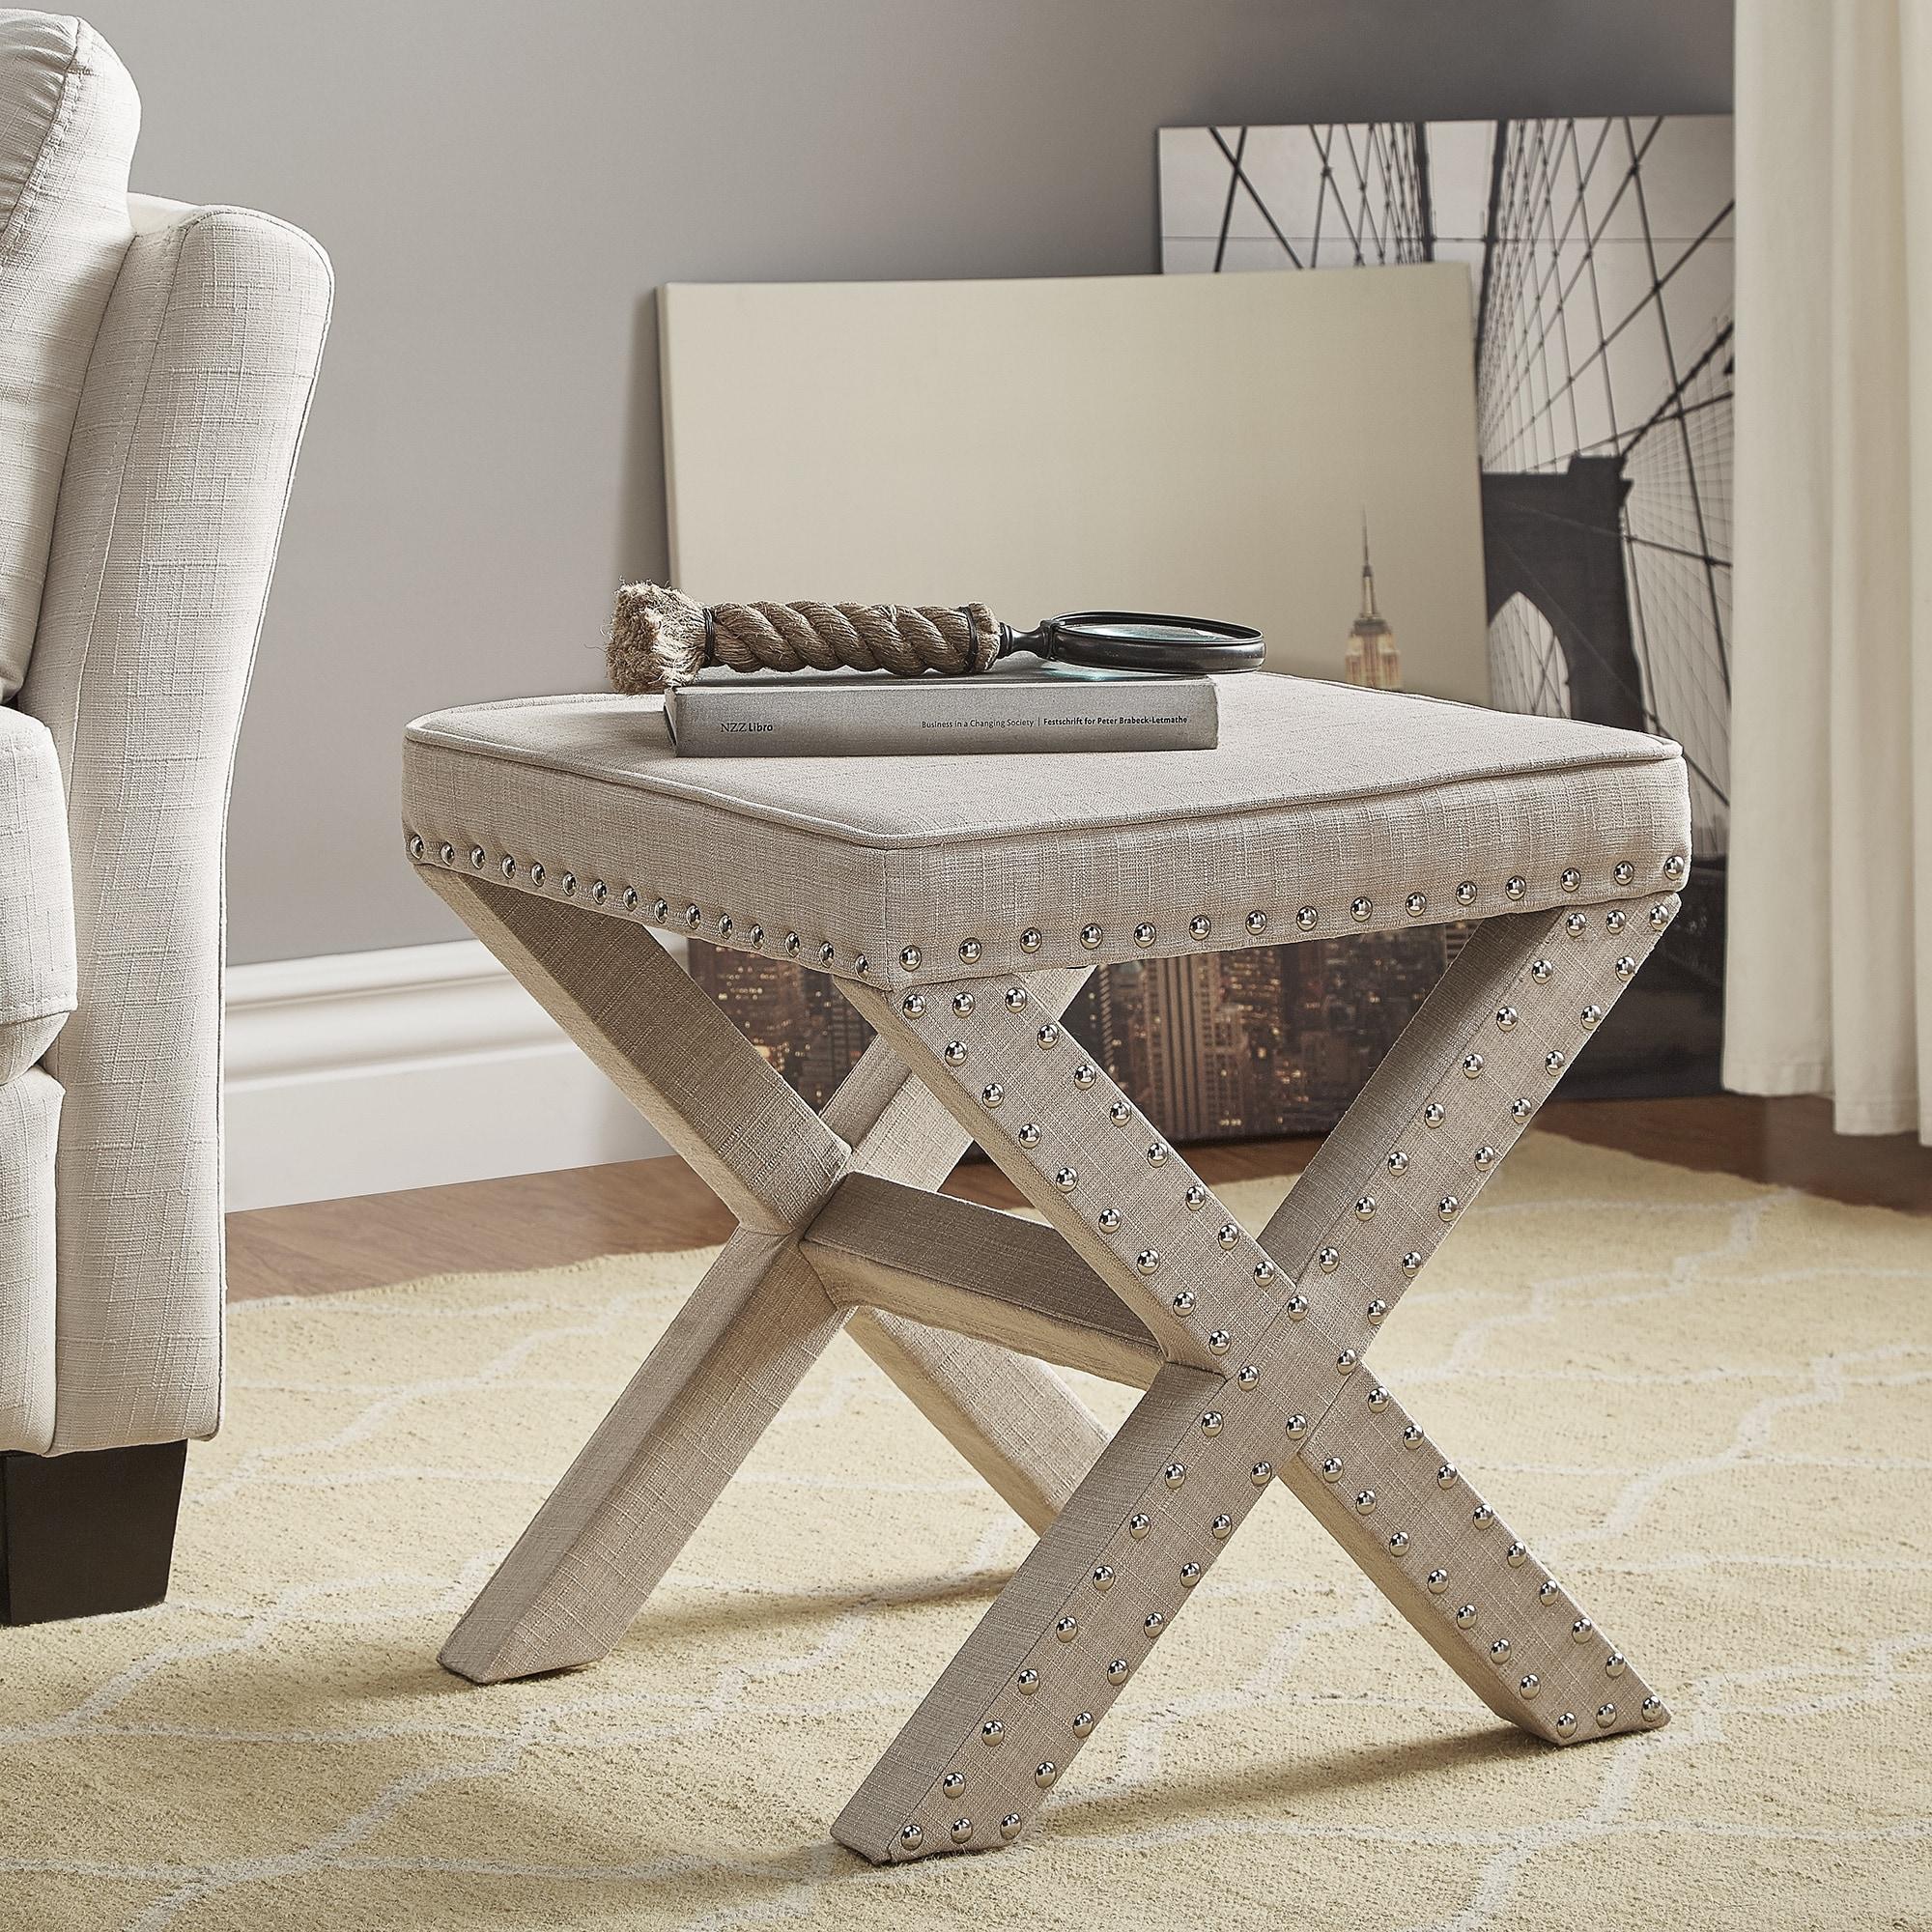 Fantástico Muebles De Ebay Otomana Friso - Muebles Para Ideas de ...